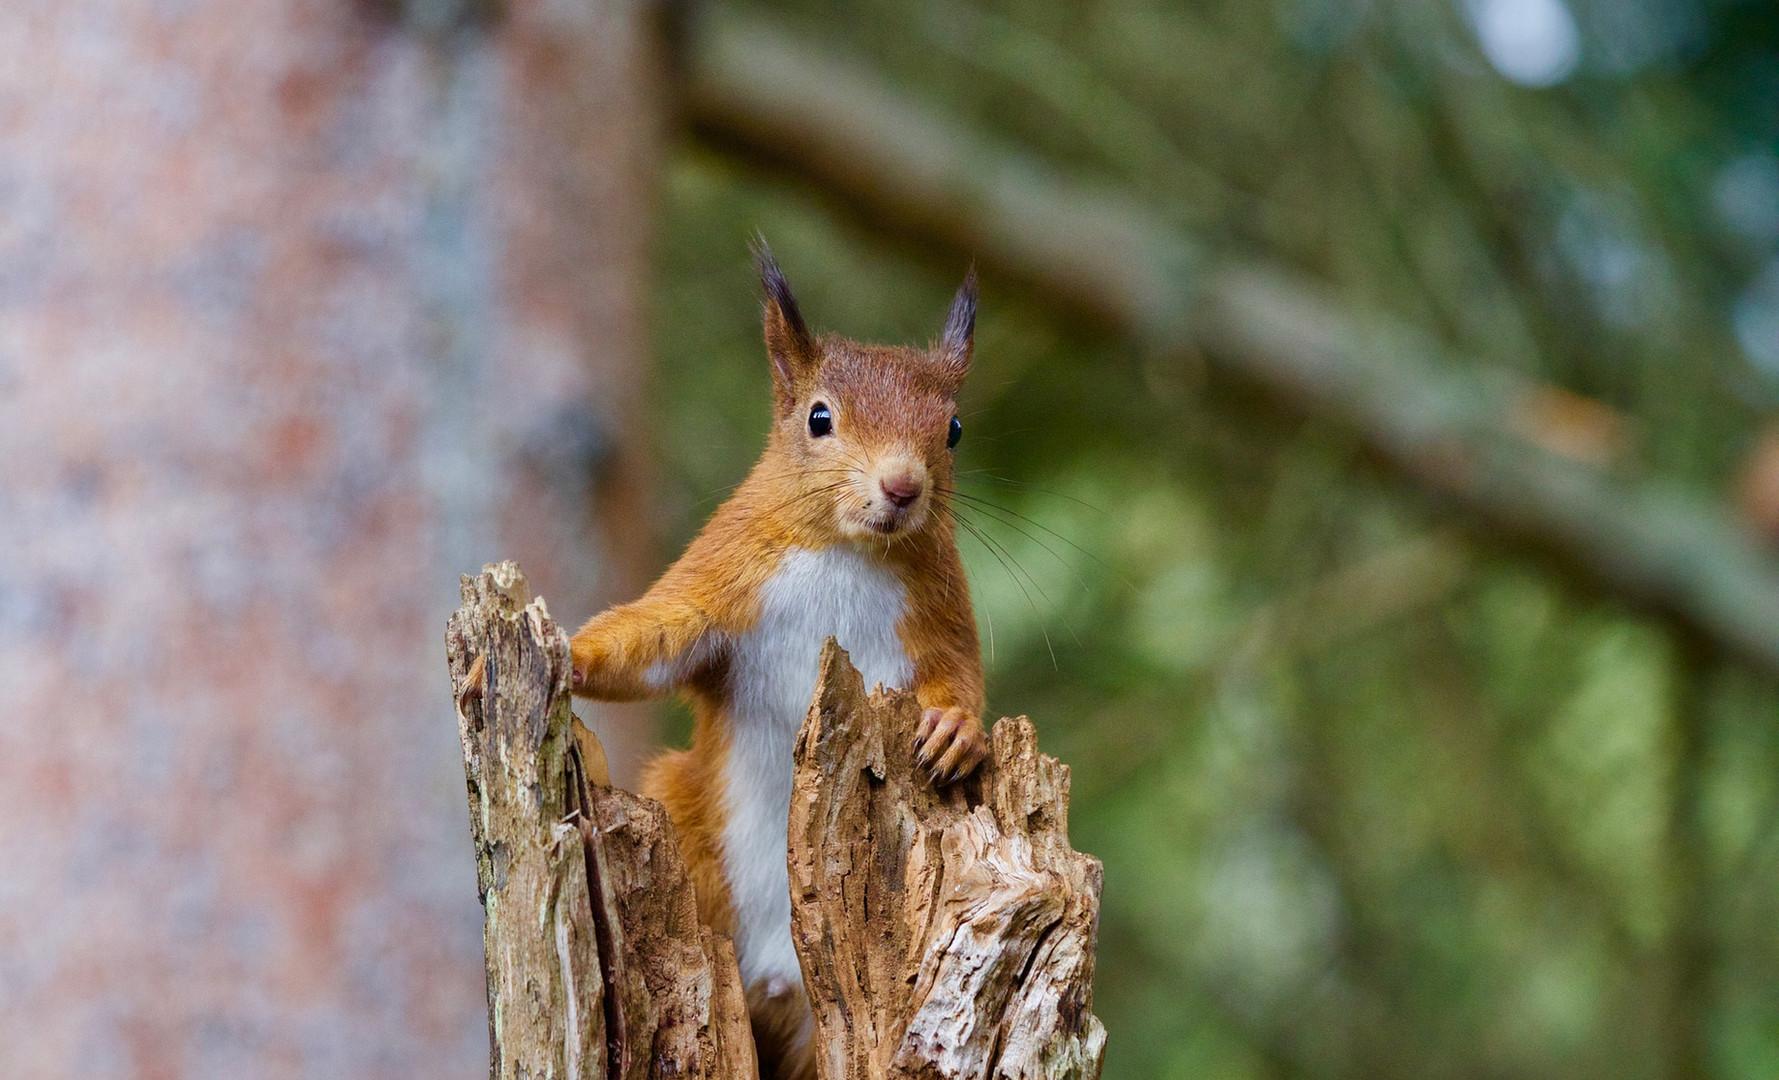 squirrel-2827760_1920.jpg